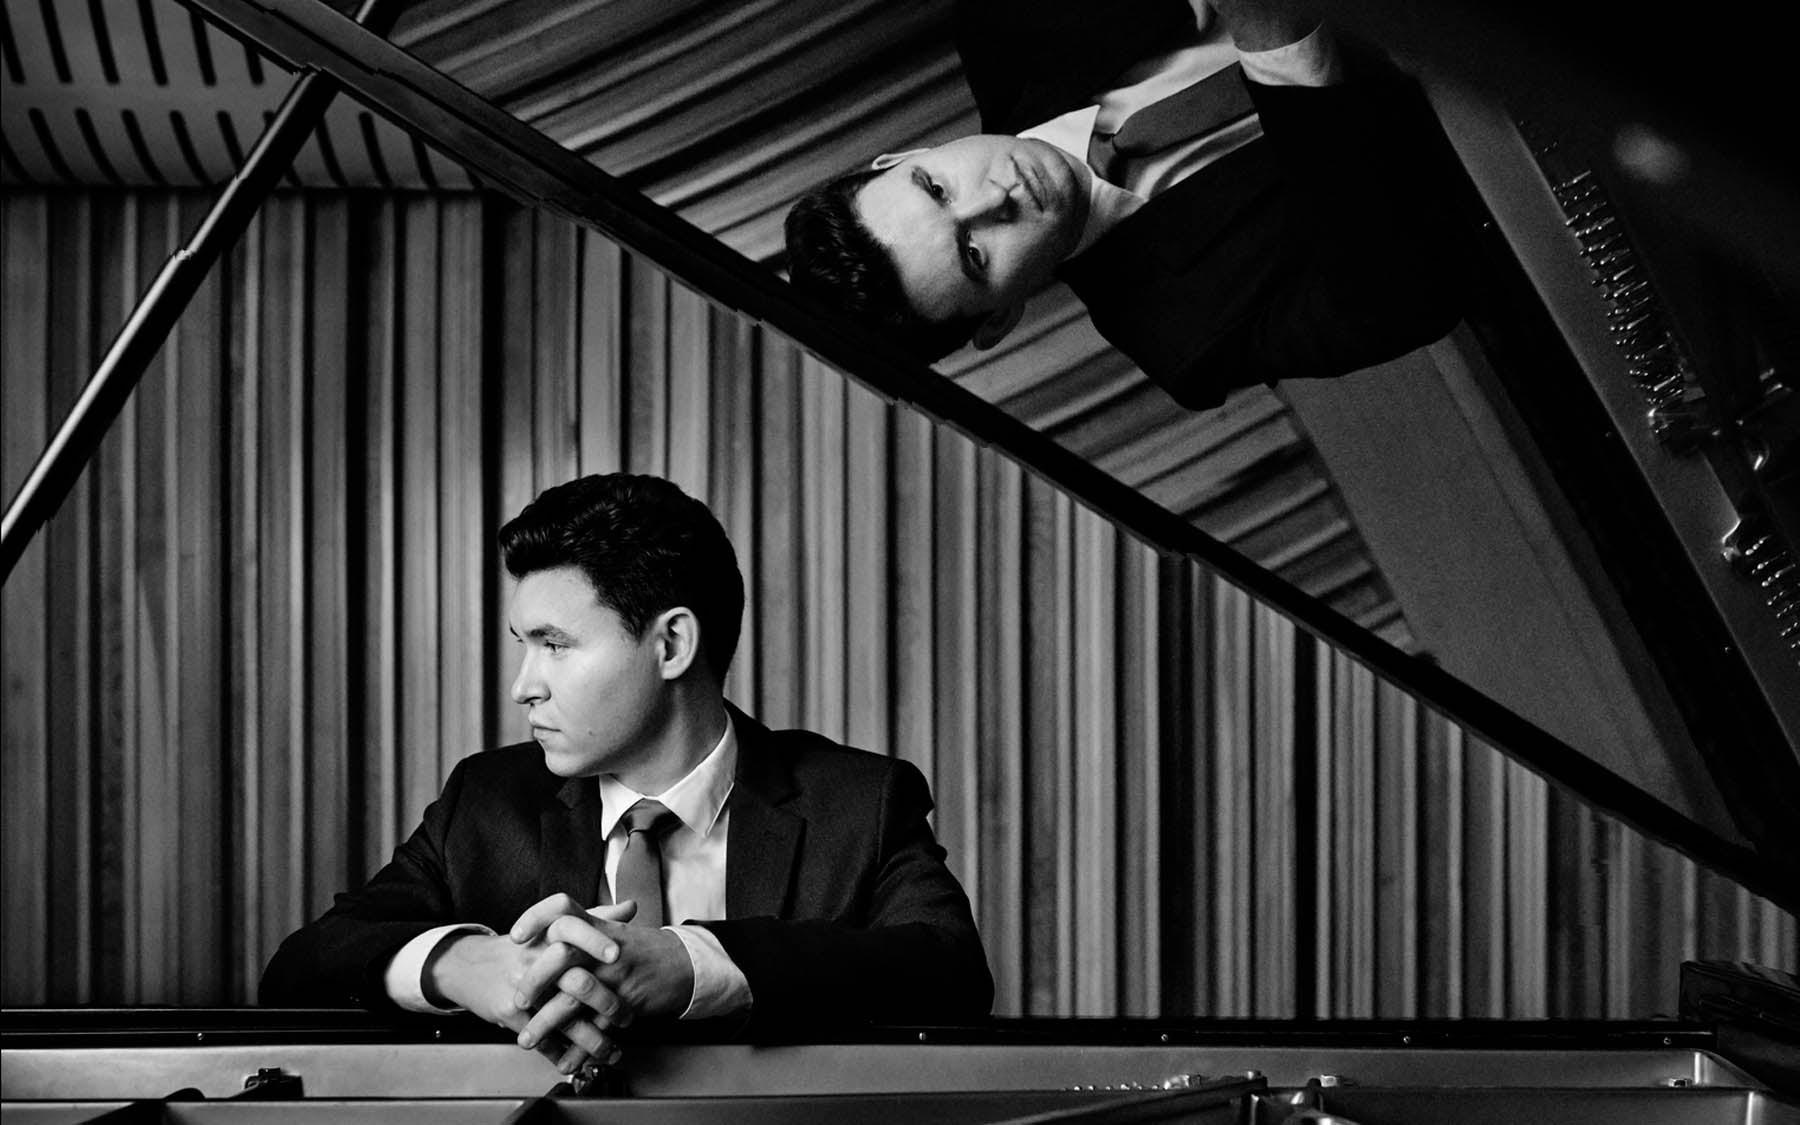 Matthew Graybil - photo by Kaupo Kikkas